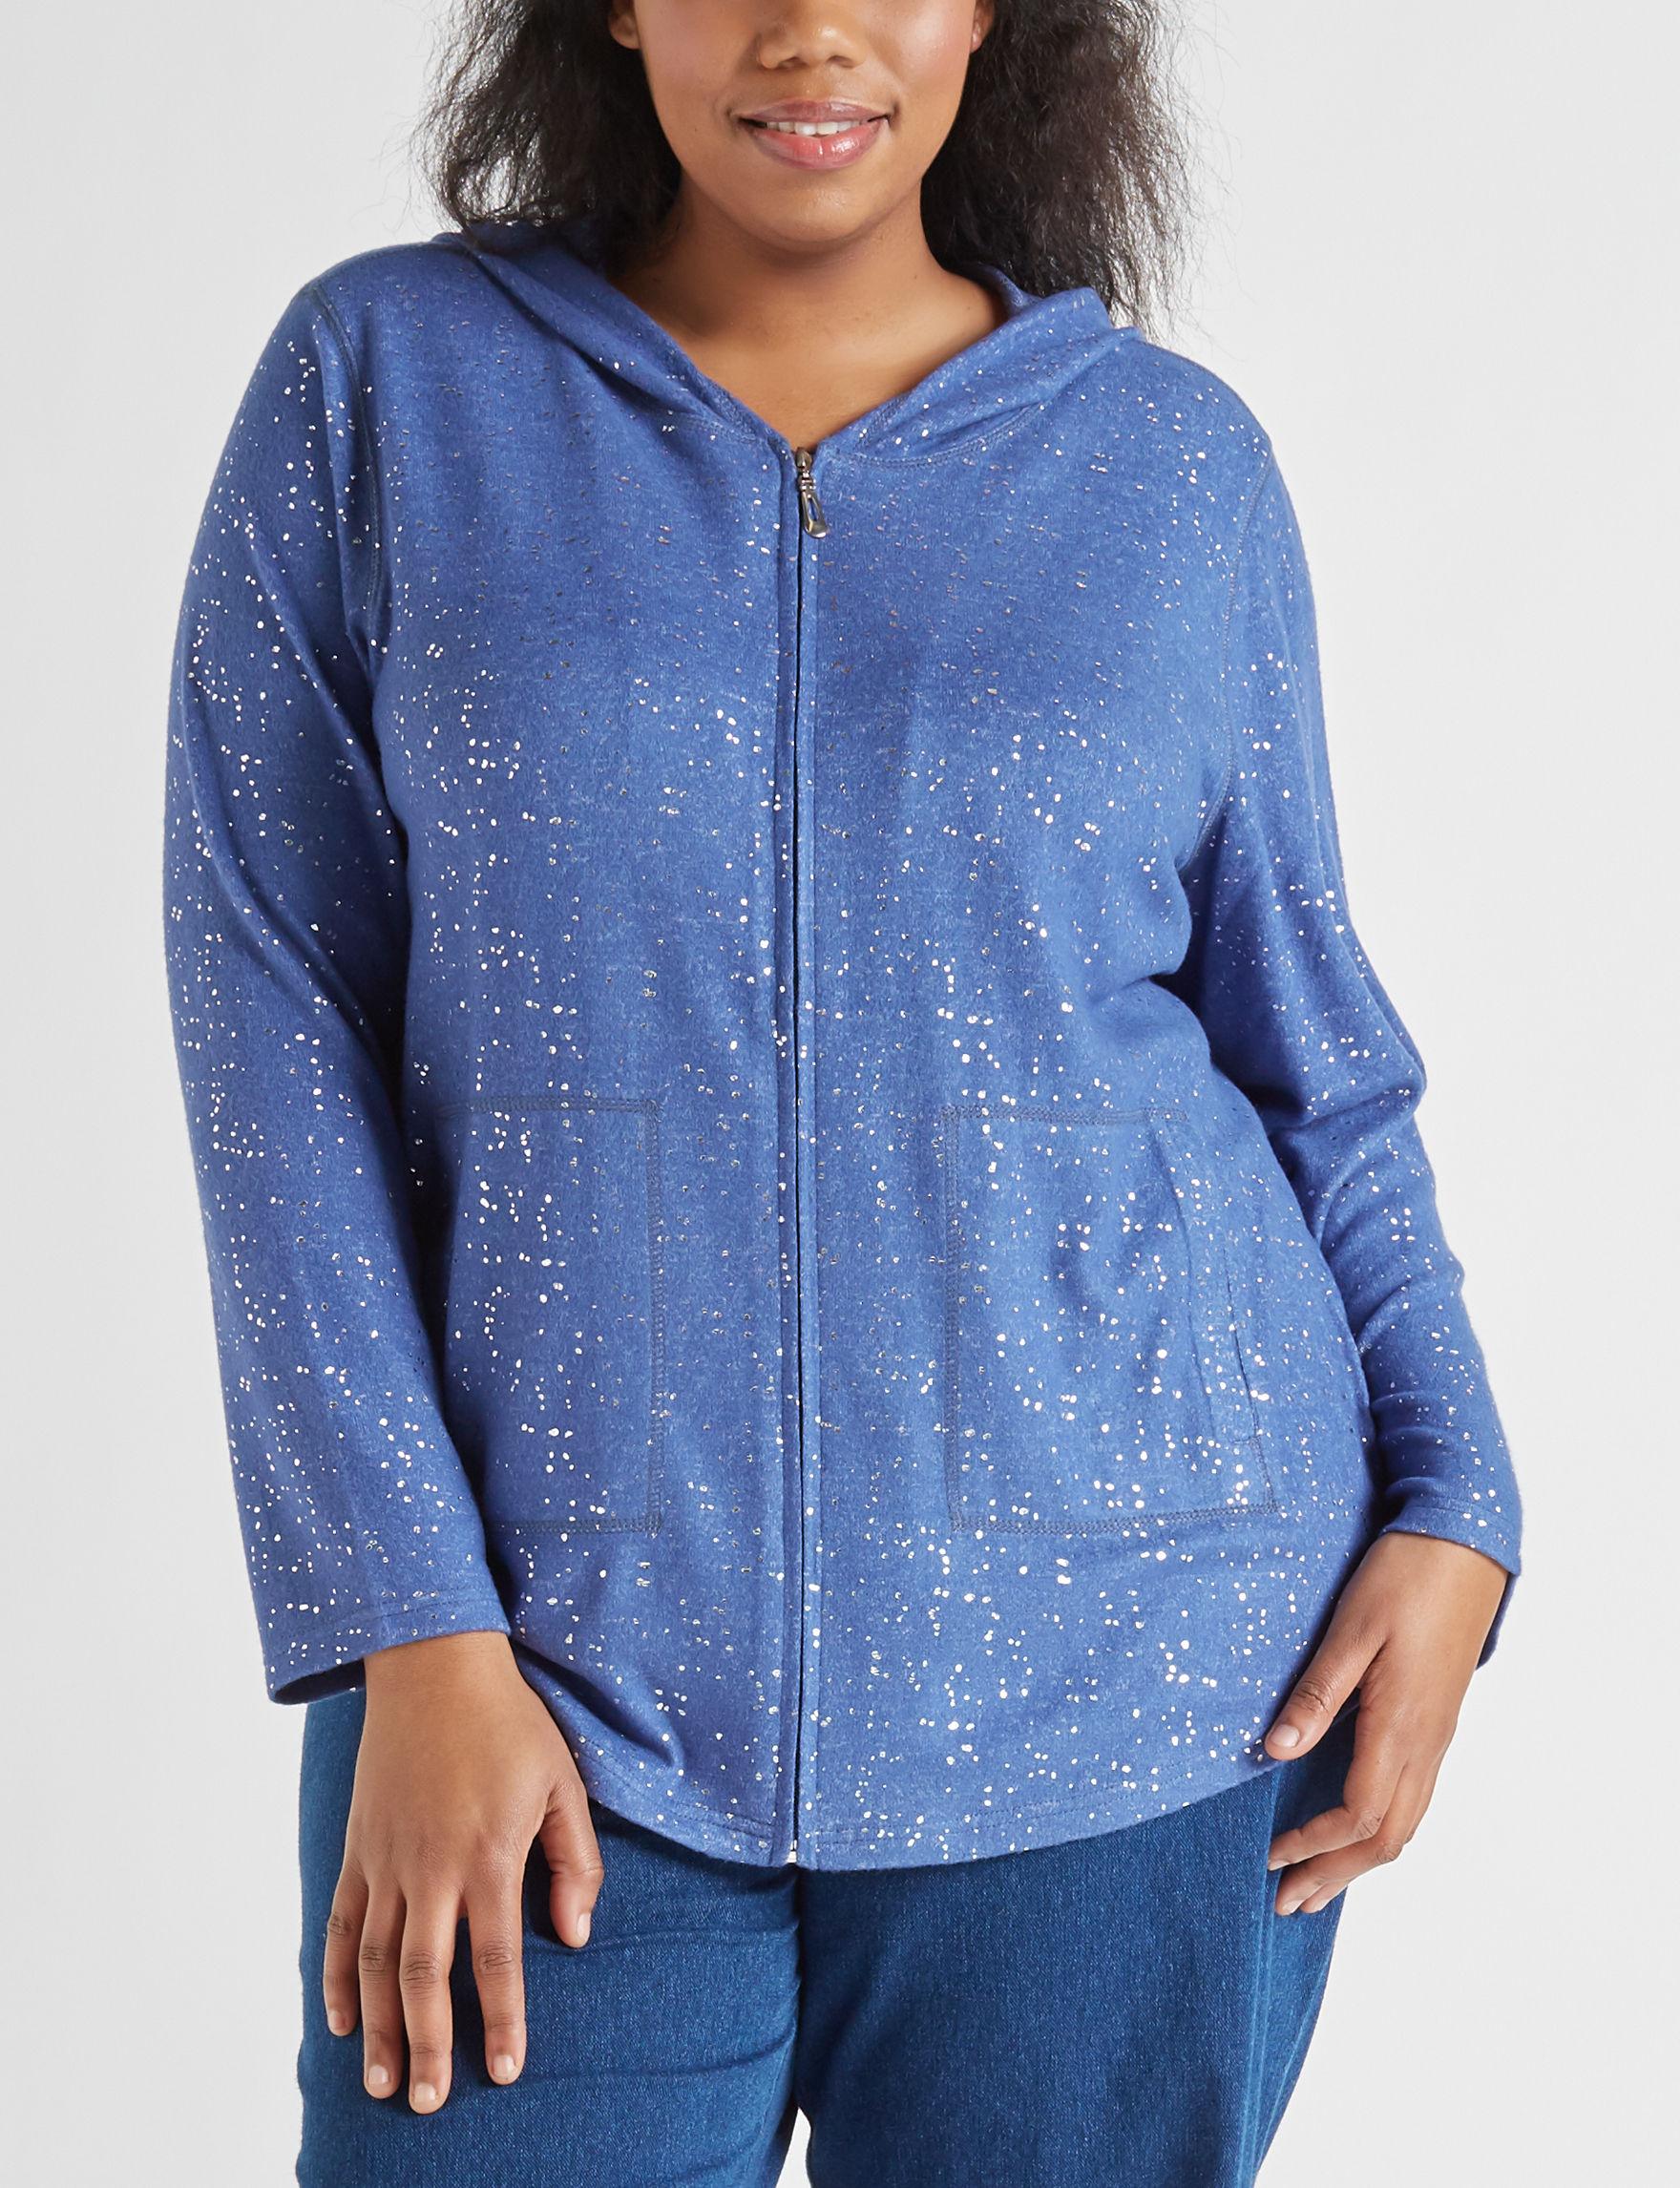 Cathy Daniels Blue / Silver Shirts & Blouses